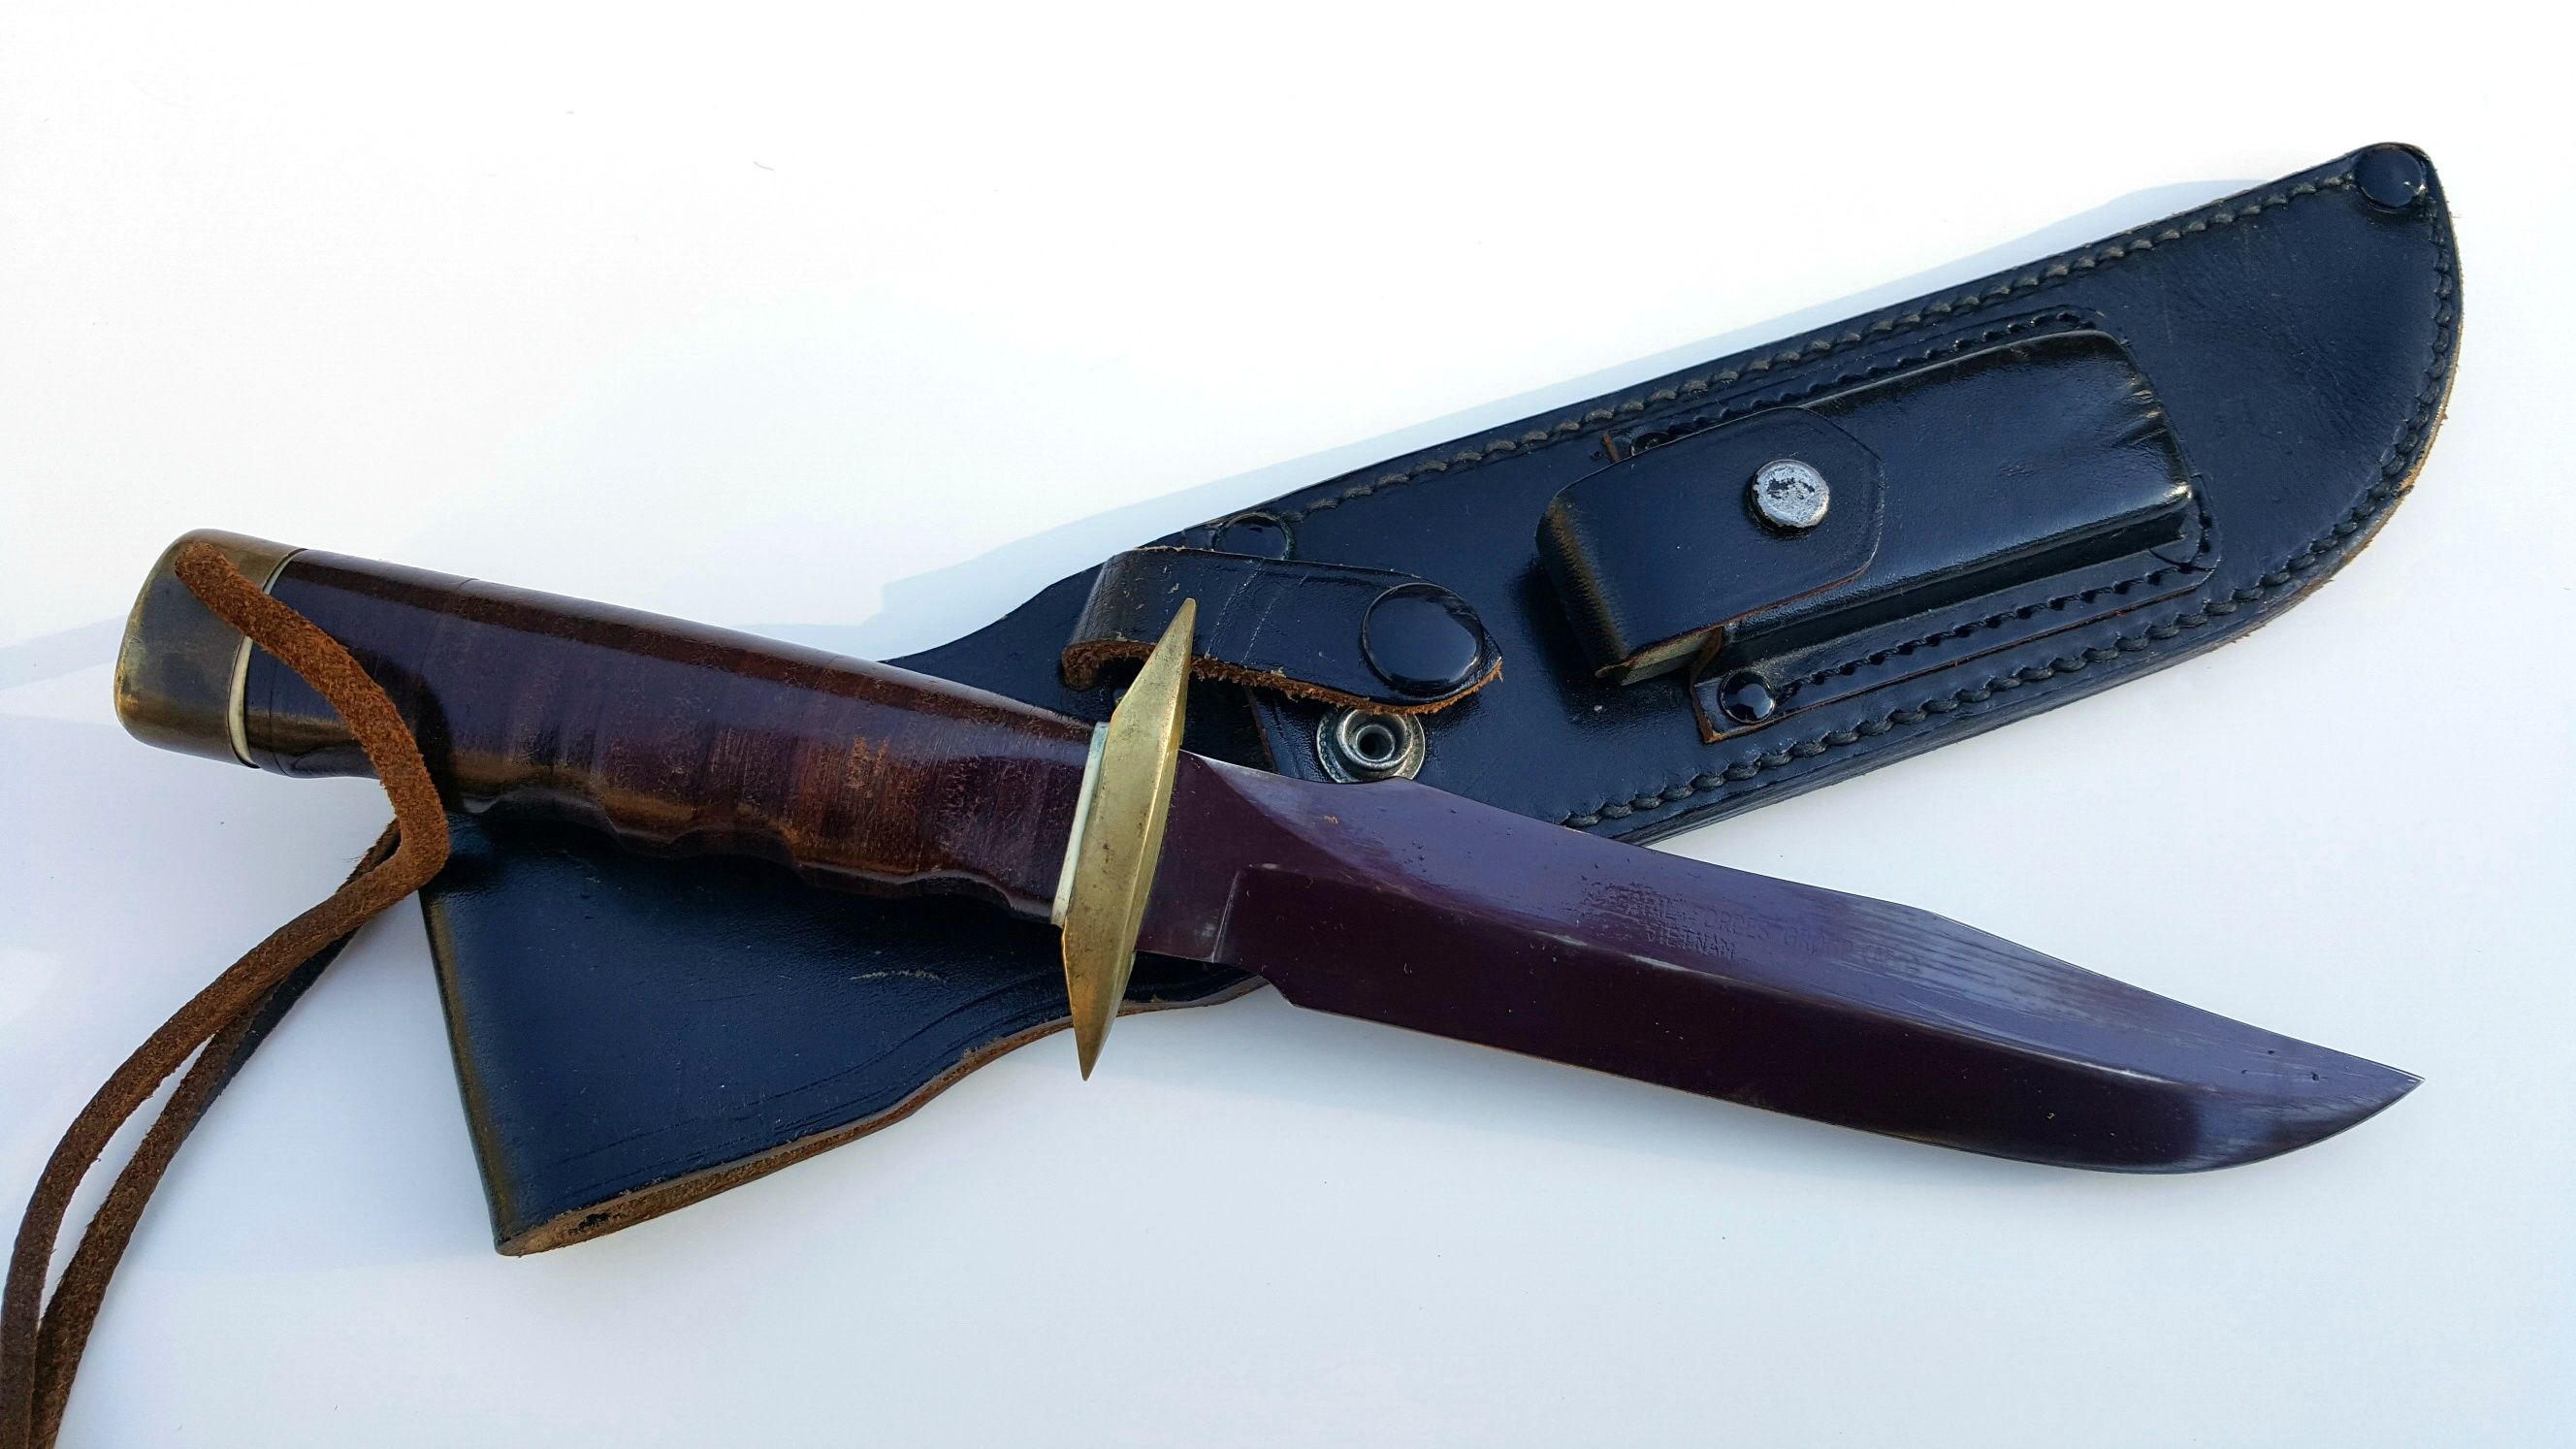 Rare Vietnam War MACV-SOG Red Blade SOG Knife aka Plum Blade